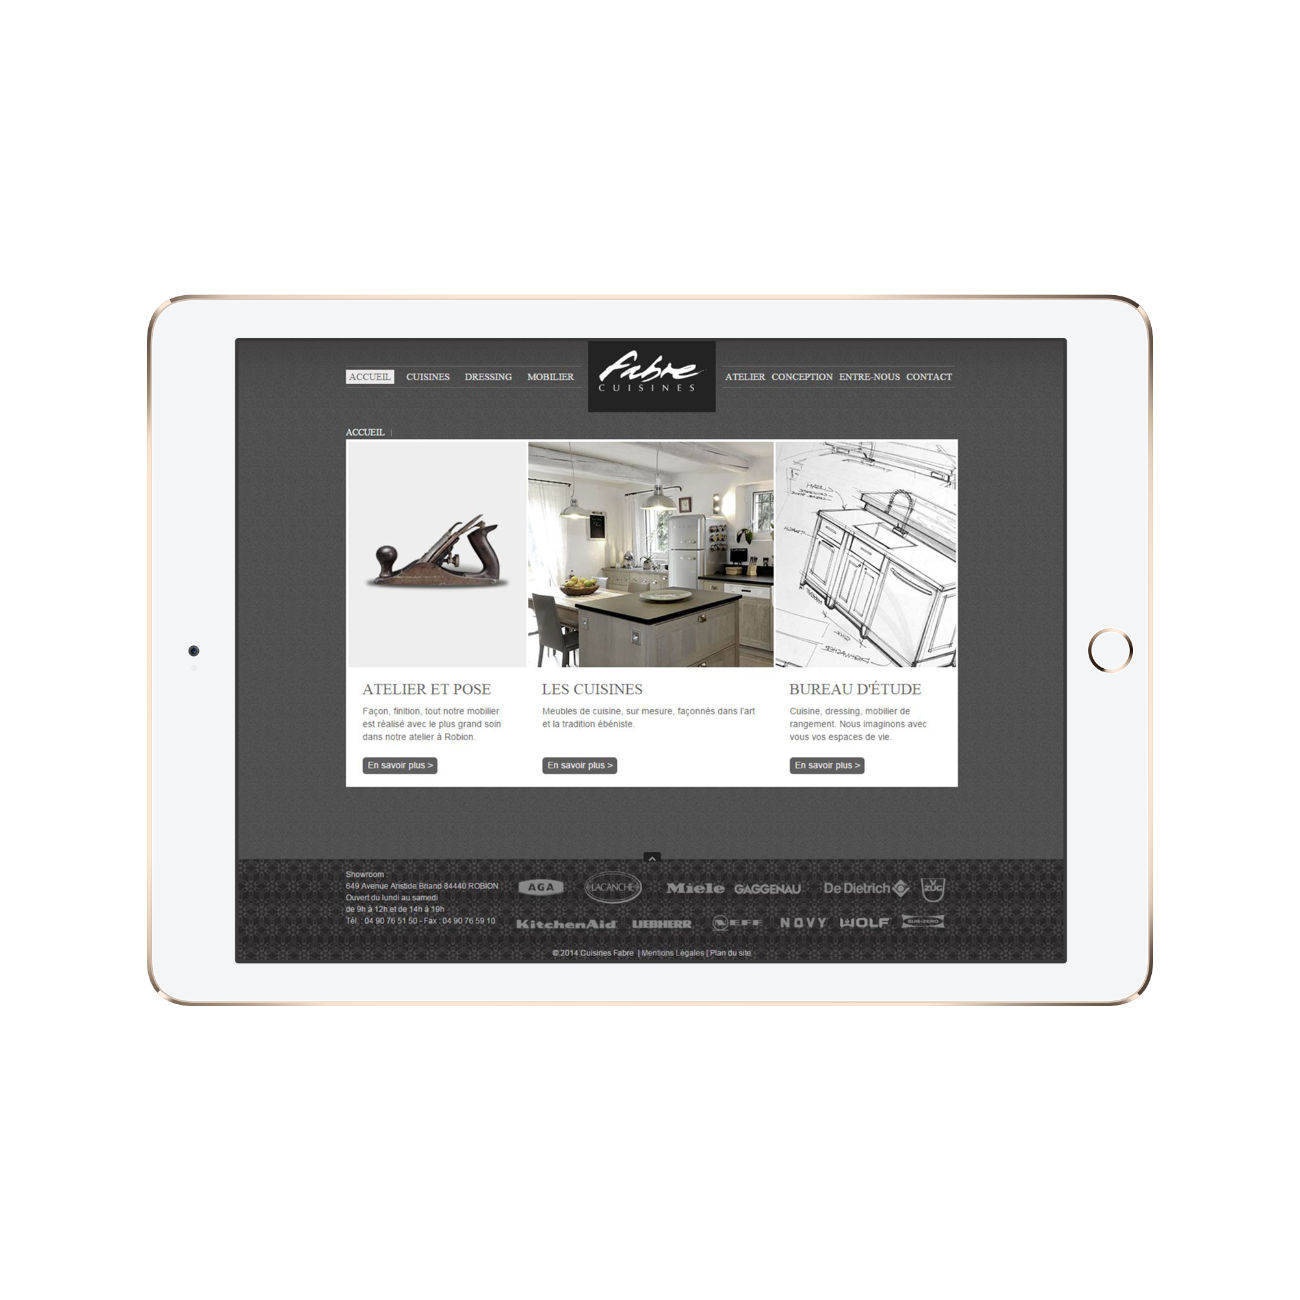 Page accueil Fabre cuisines tablette